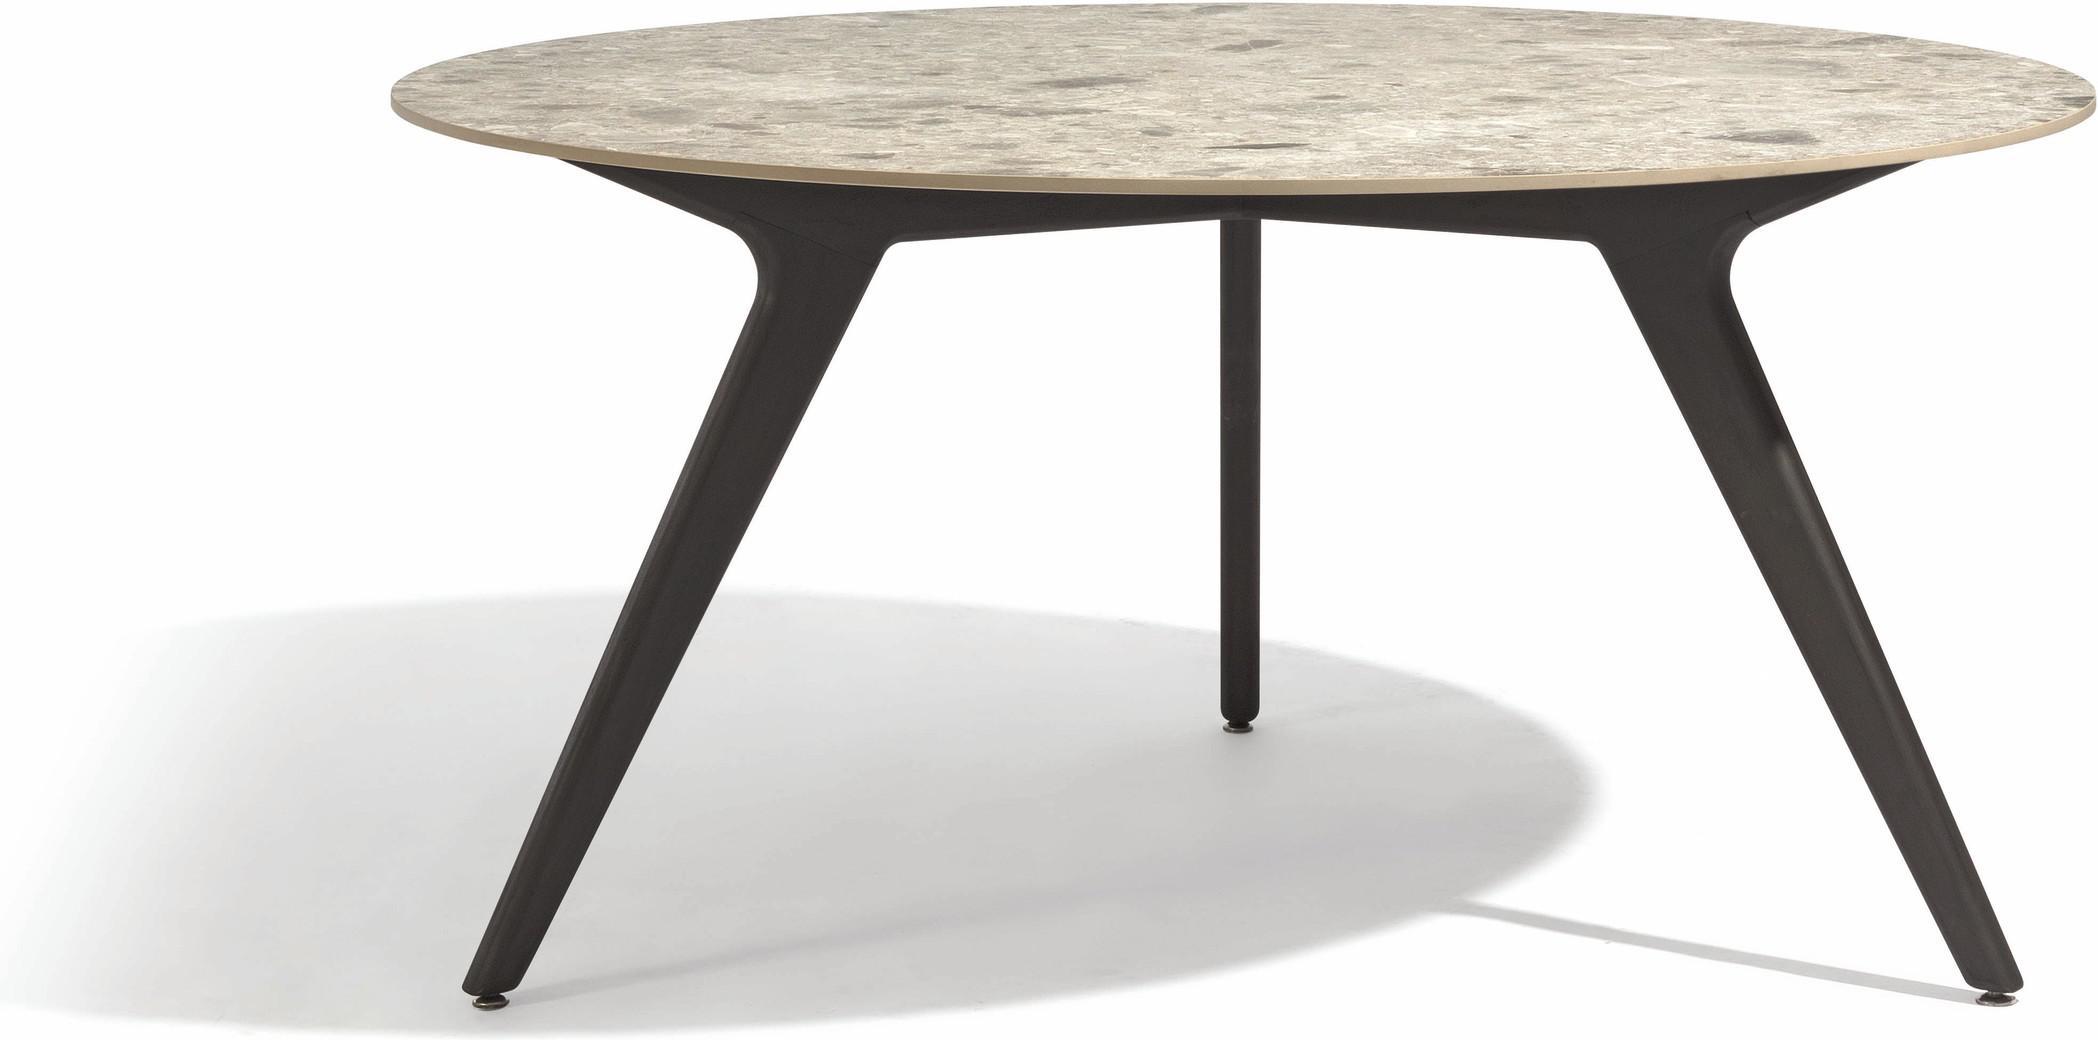 Torsa Dining table - Teak nero - CT 148